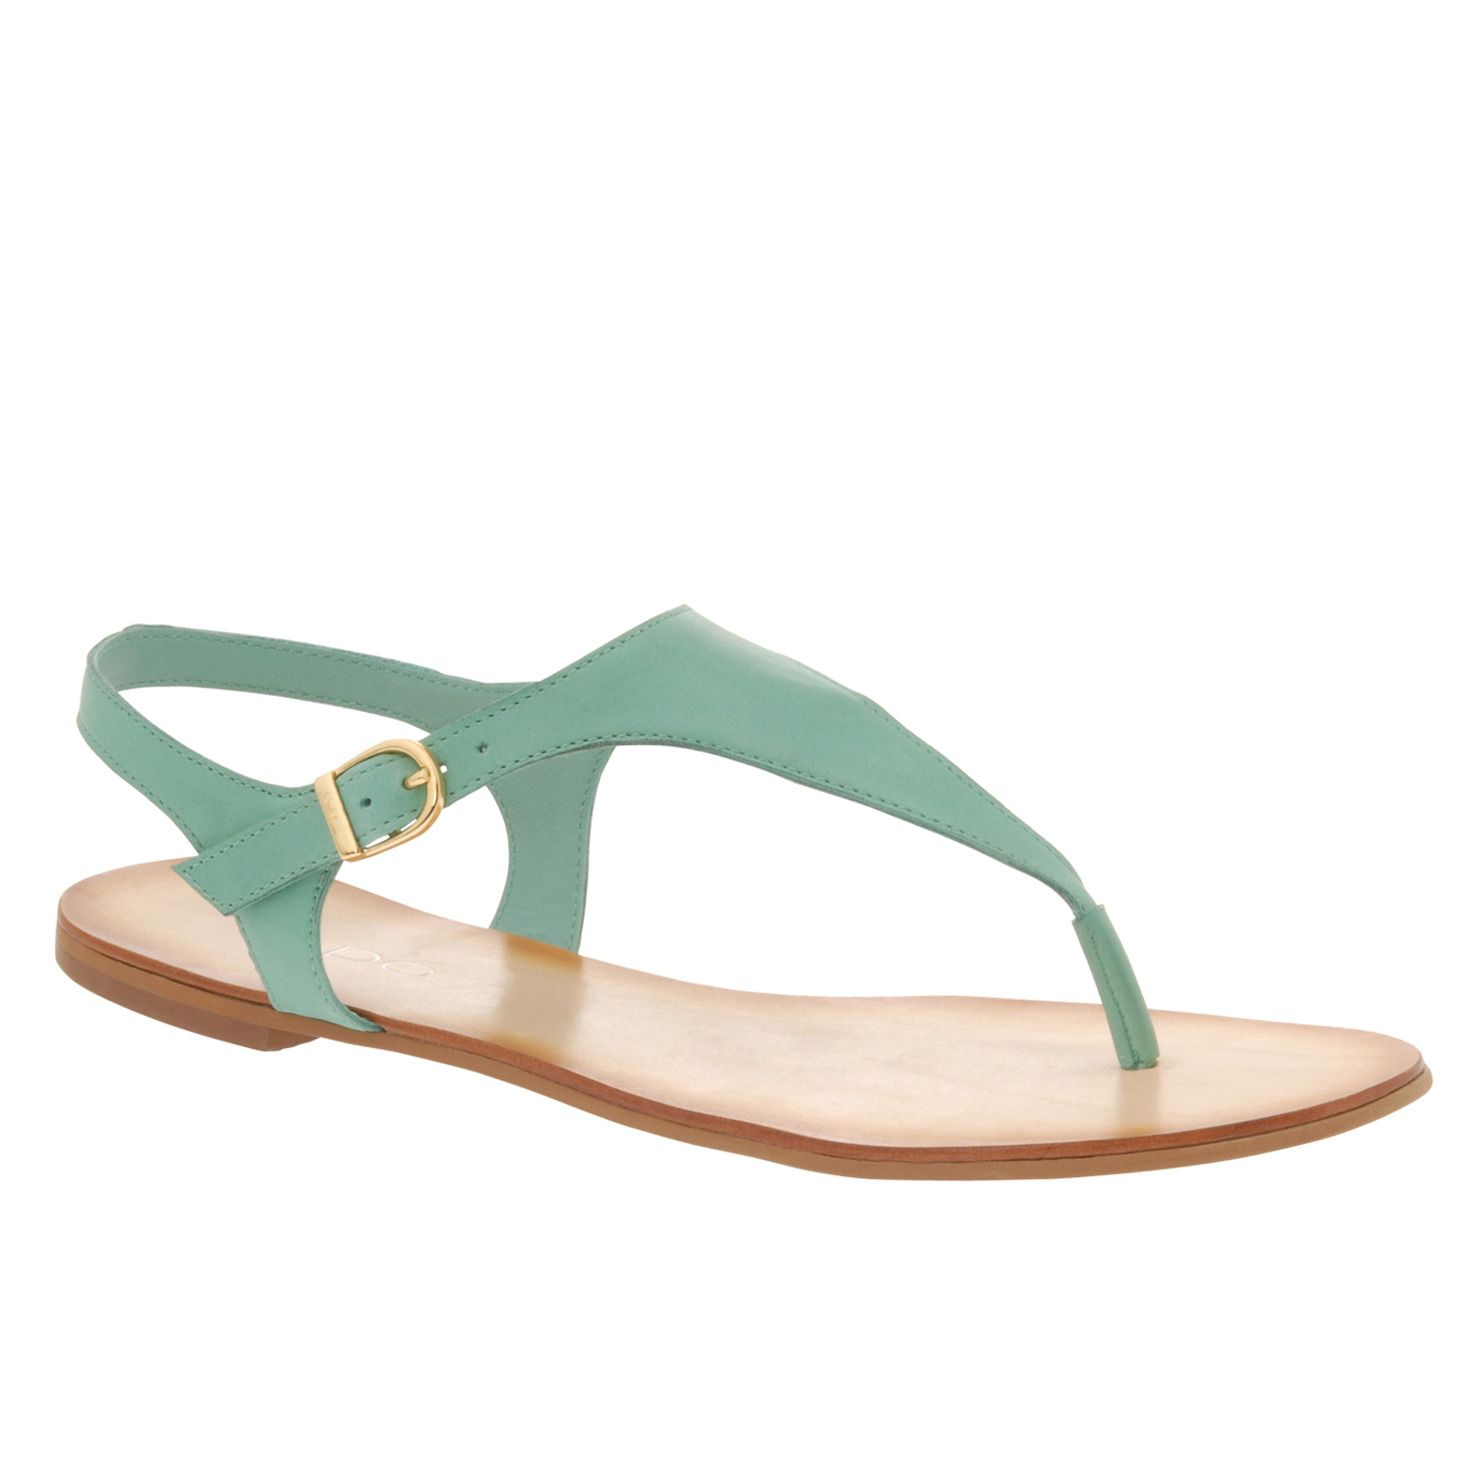 03570b758 Aldo Sprouls sandal